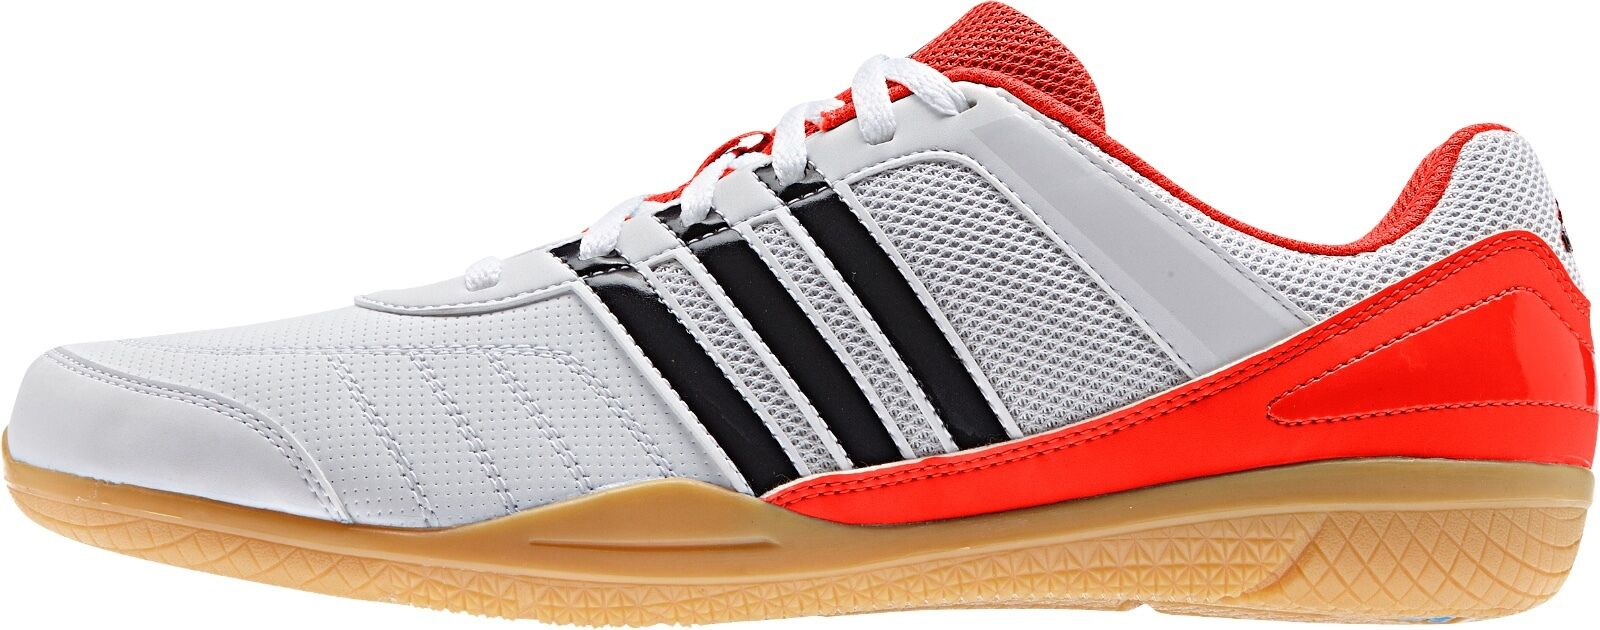 Adidas Courtblast Courtblast Courtblast Team TT-Schuh   NEU+OVP ceecaf